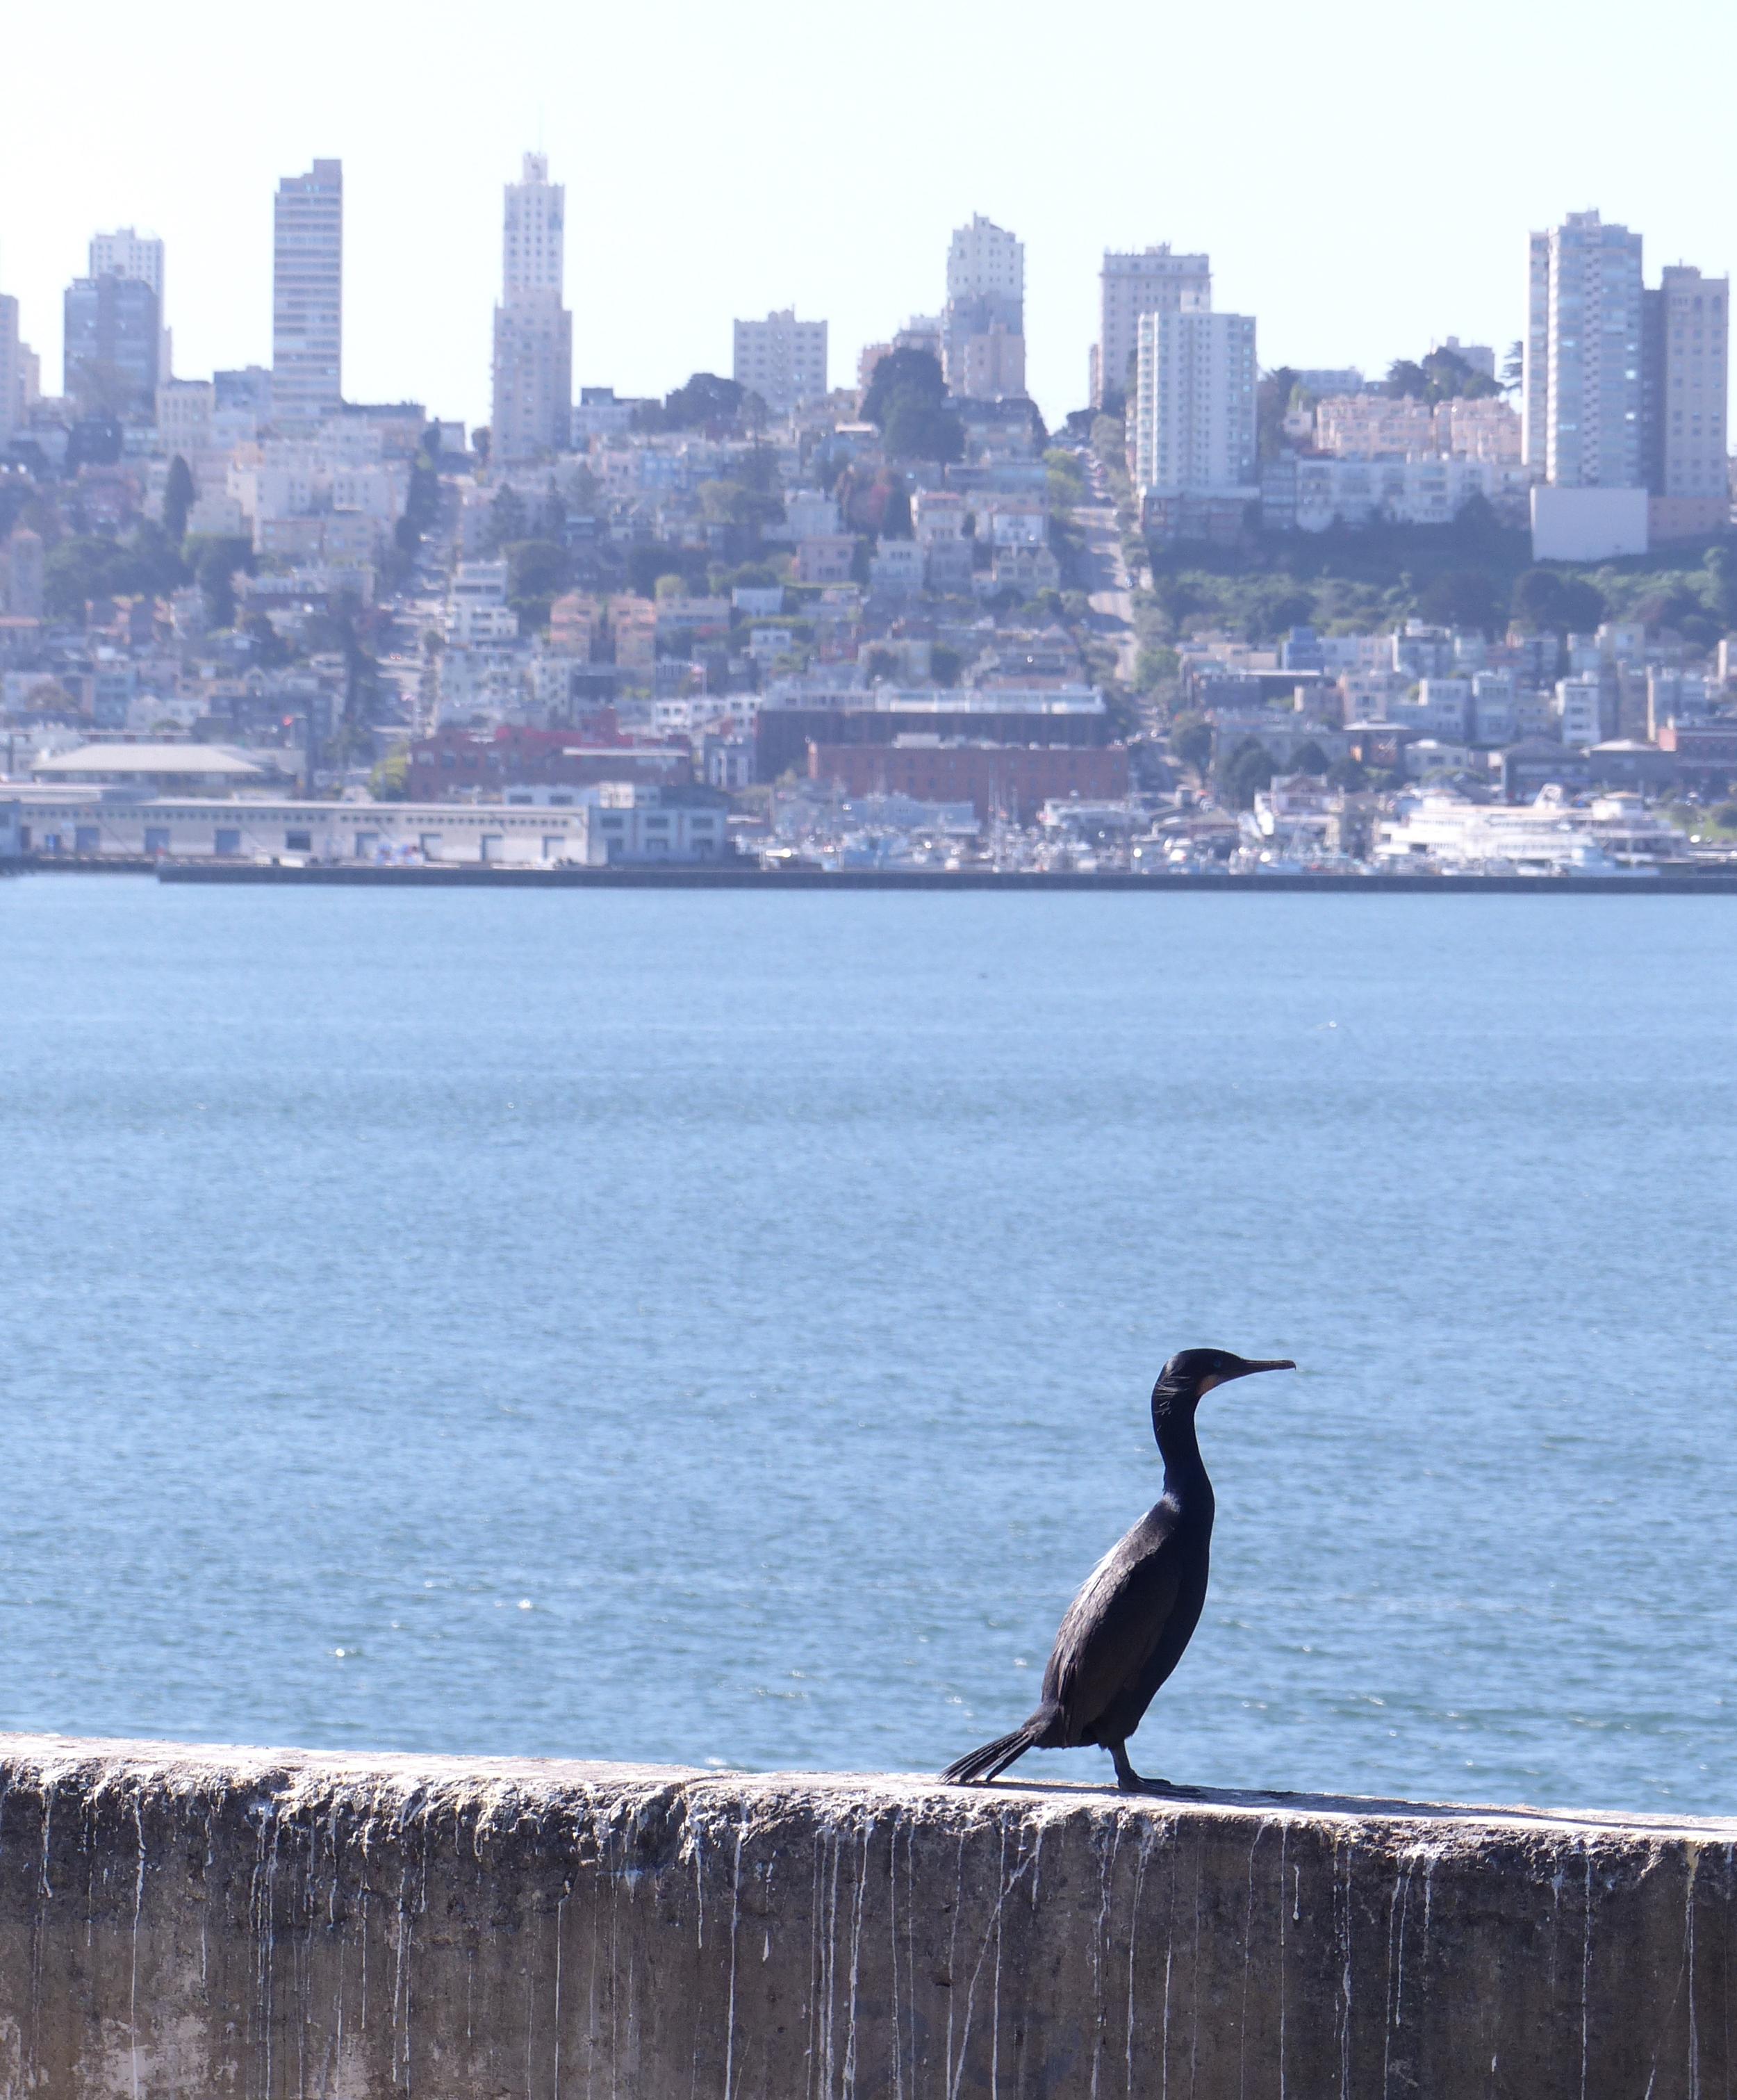 Cormorant on Alcatraz Island with San Francisco behind. Photo by Heather Robinson.